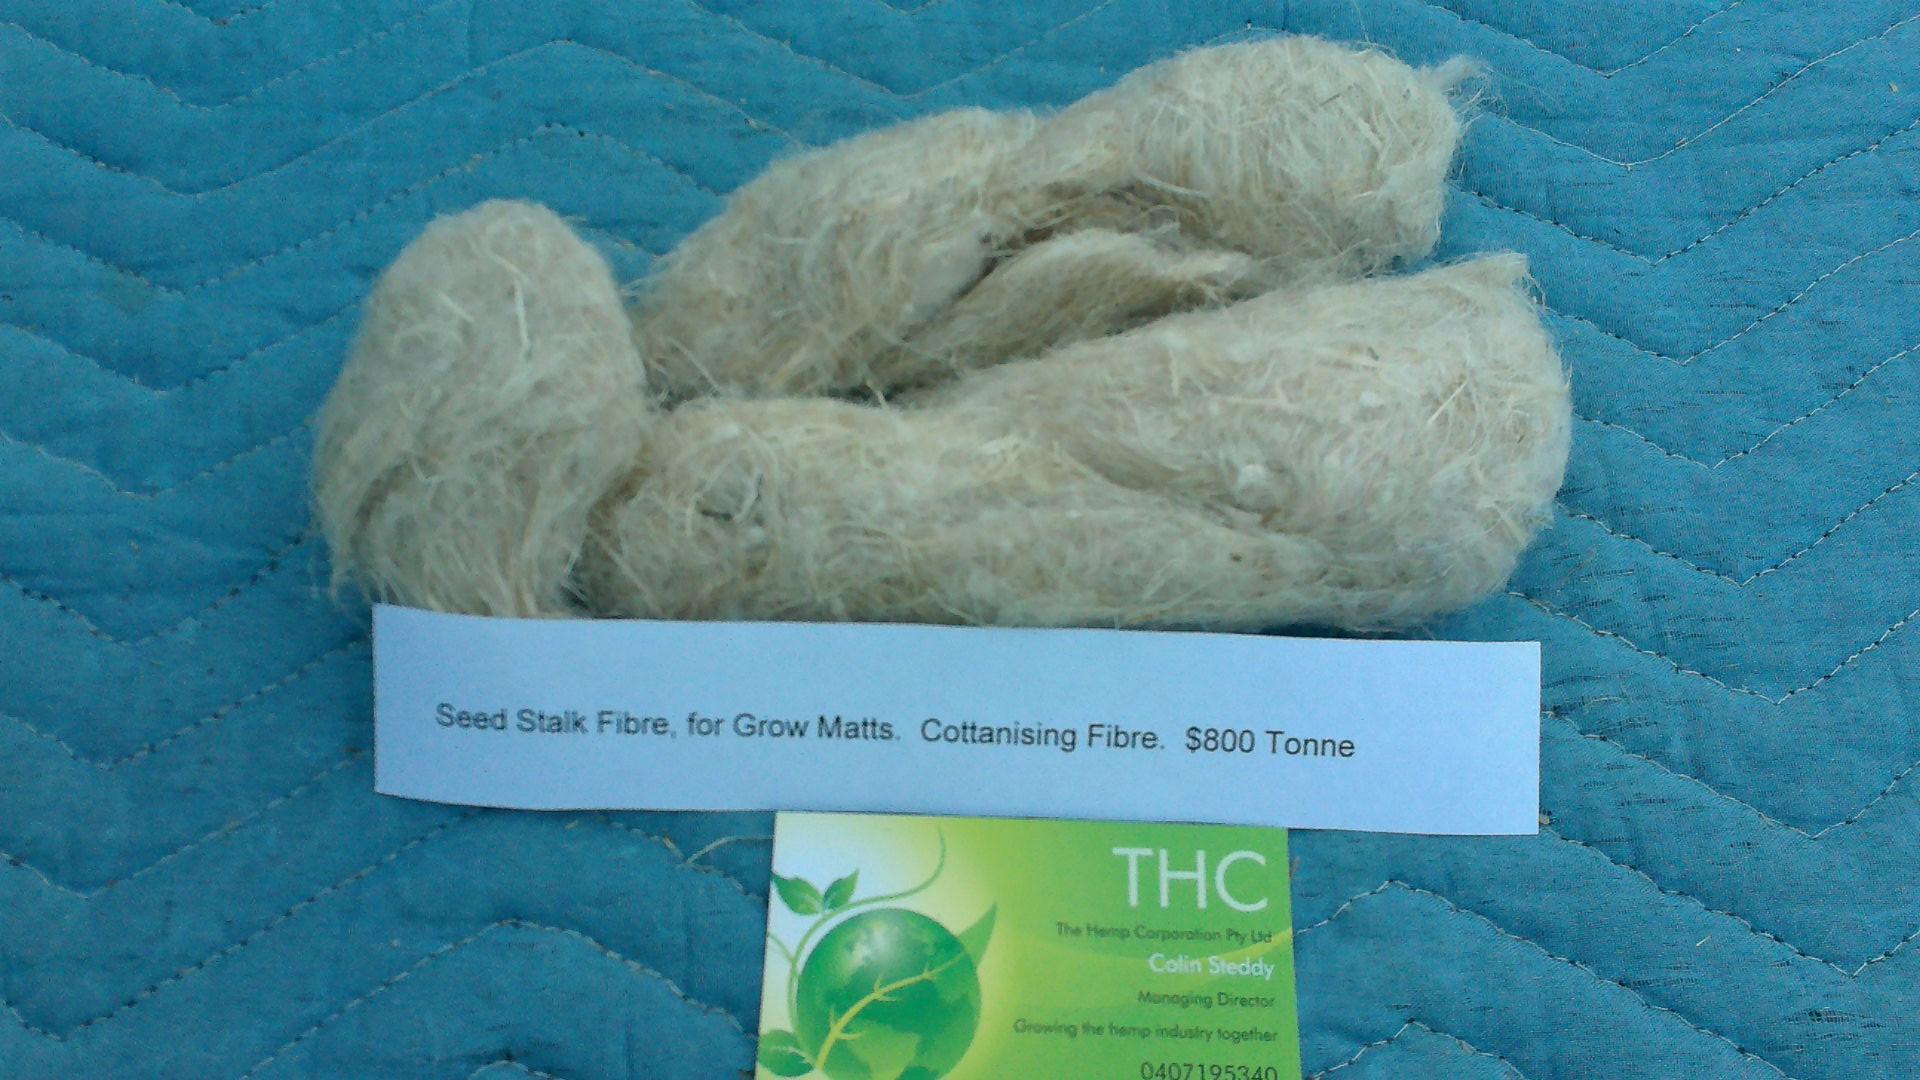 Seed stalk fibre